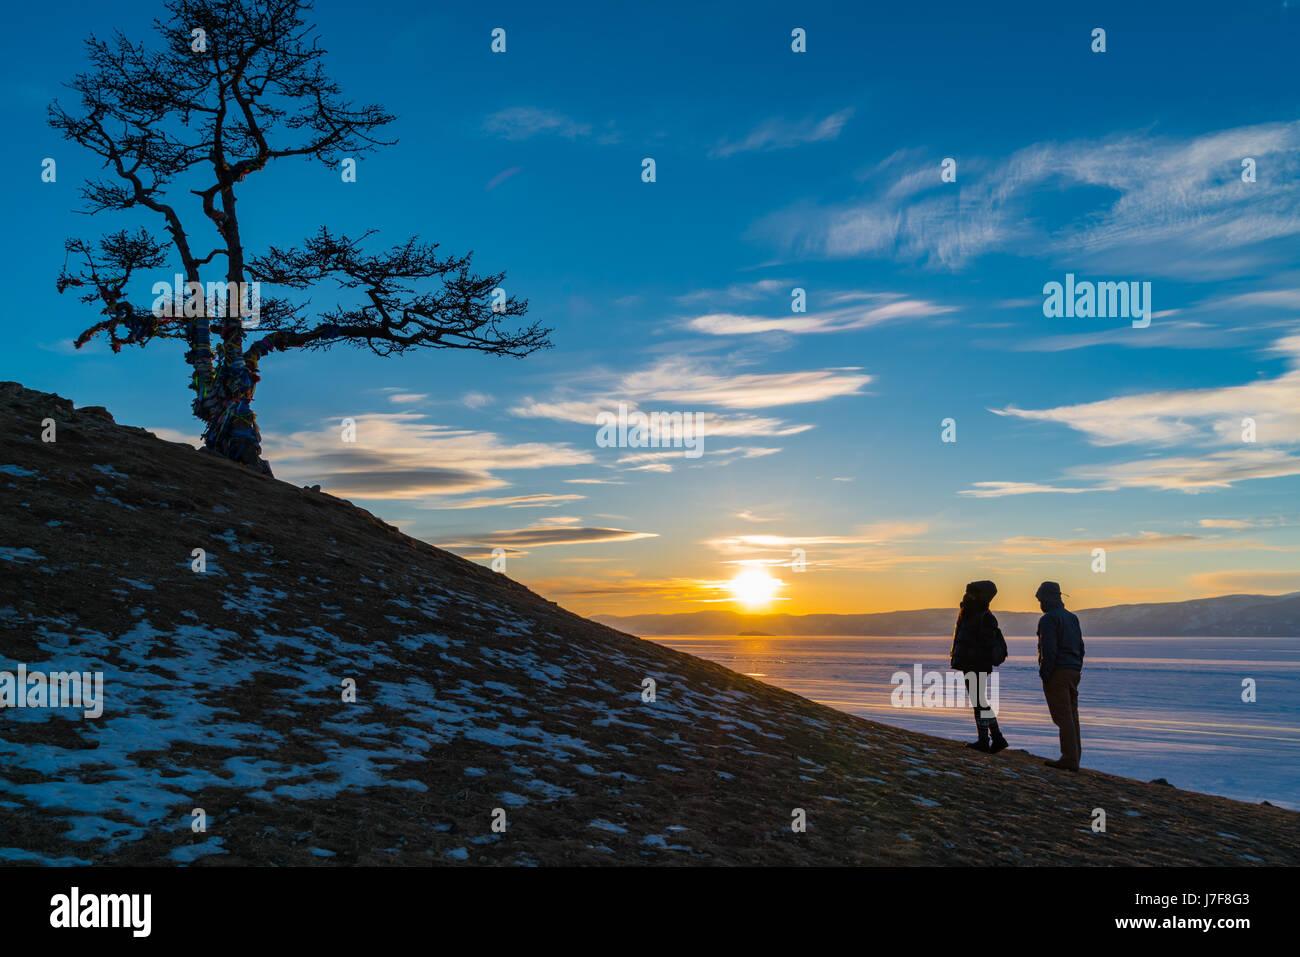 Silhouette scene of sacred tree at Cape Burkhan on Olkhon Island in Lake Baikal at sunset - Stock Image